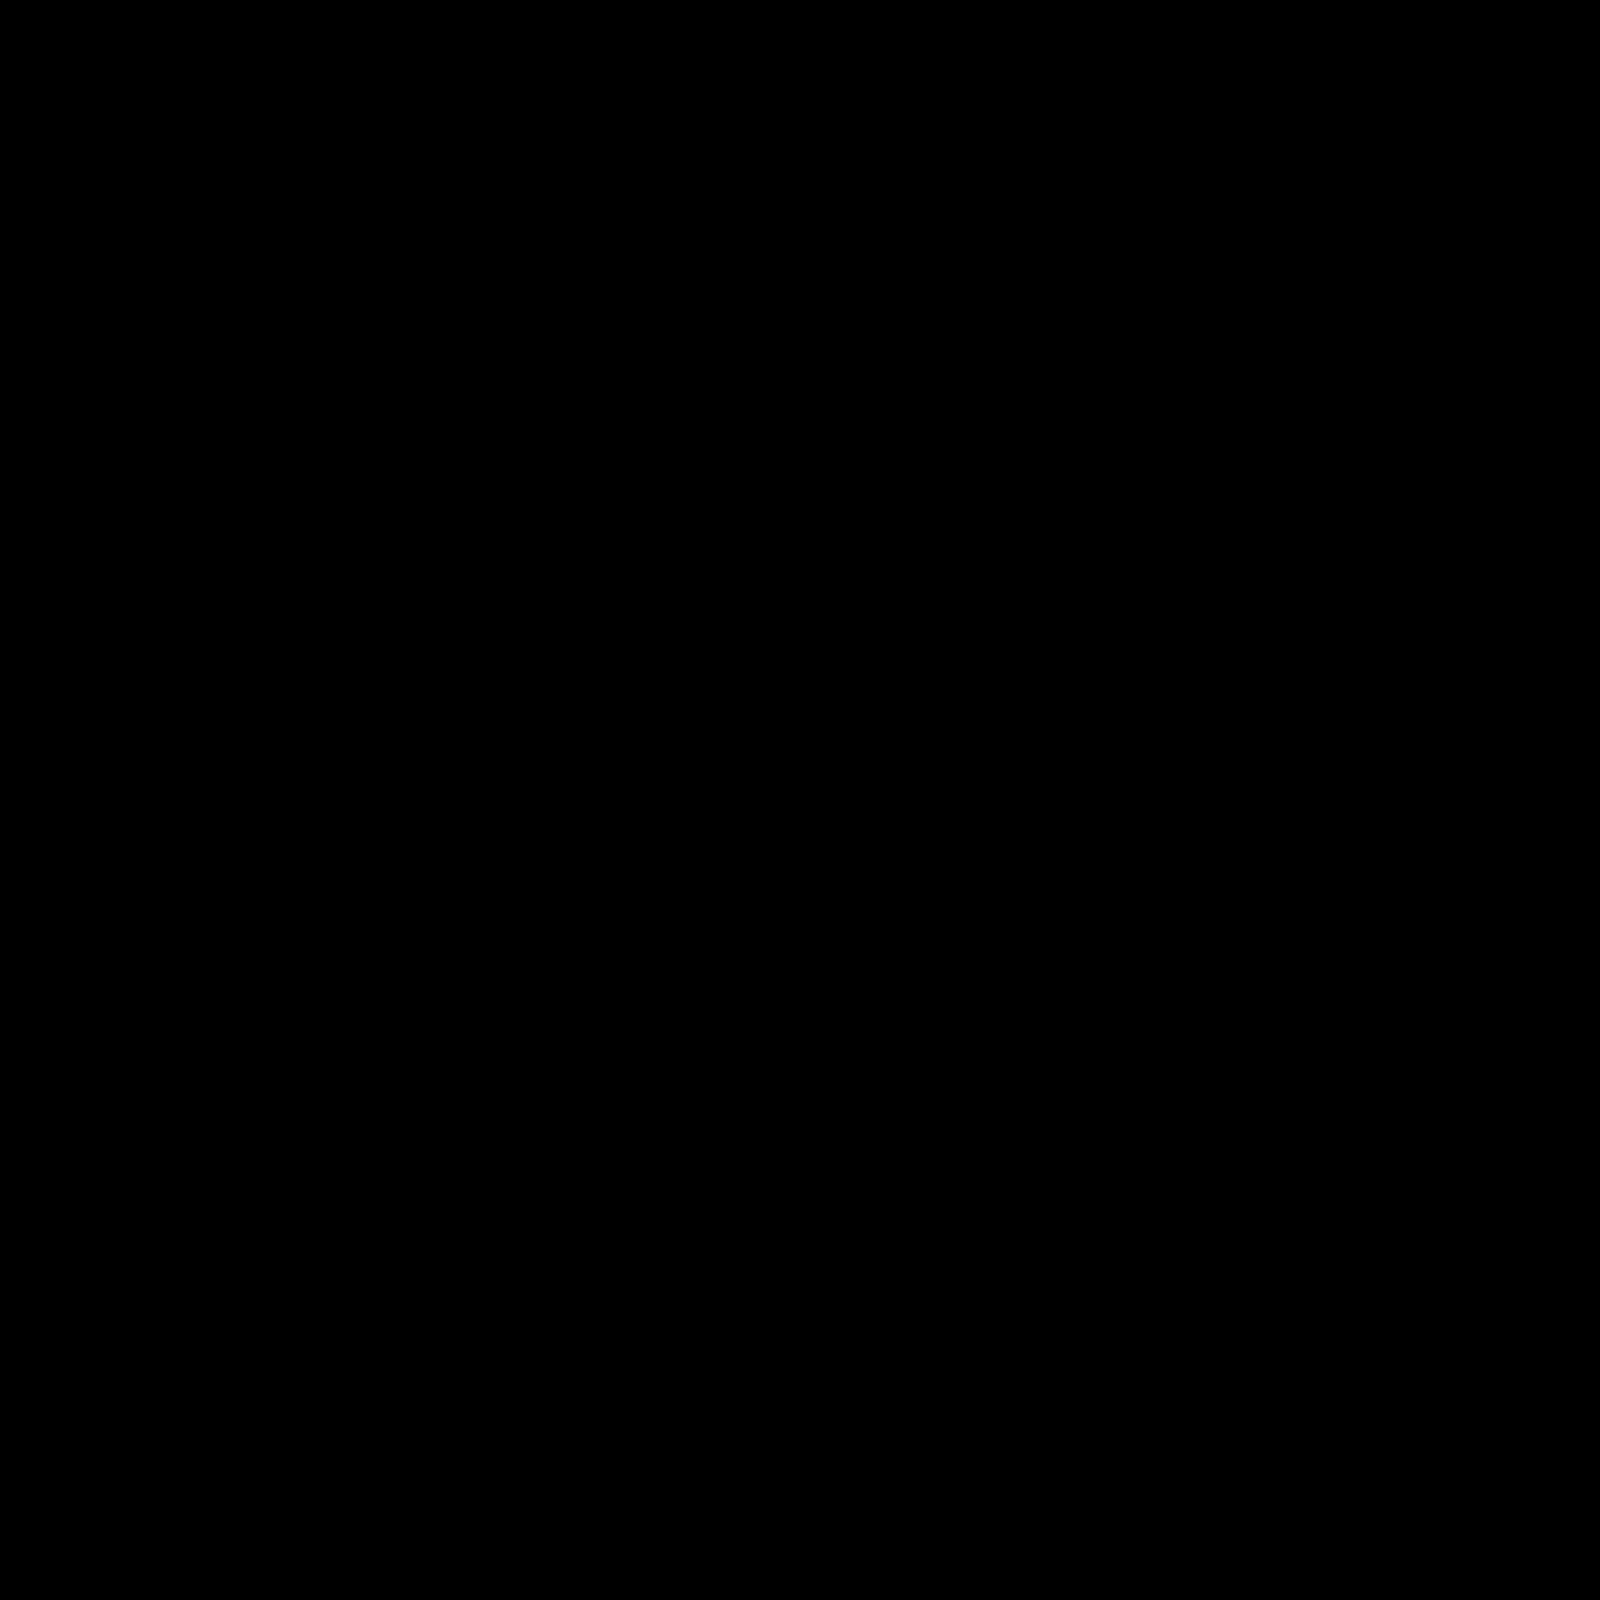 3d Waga icon